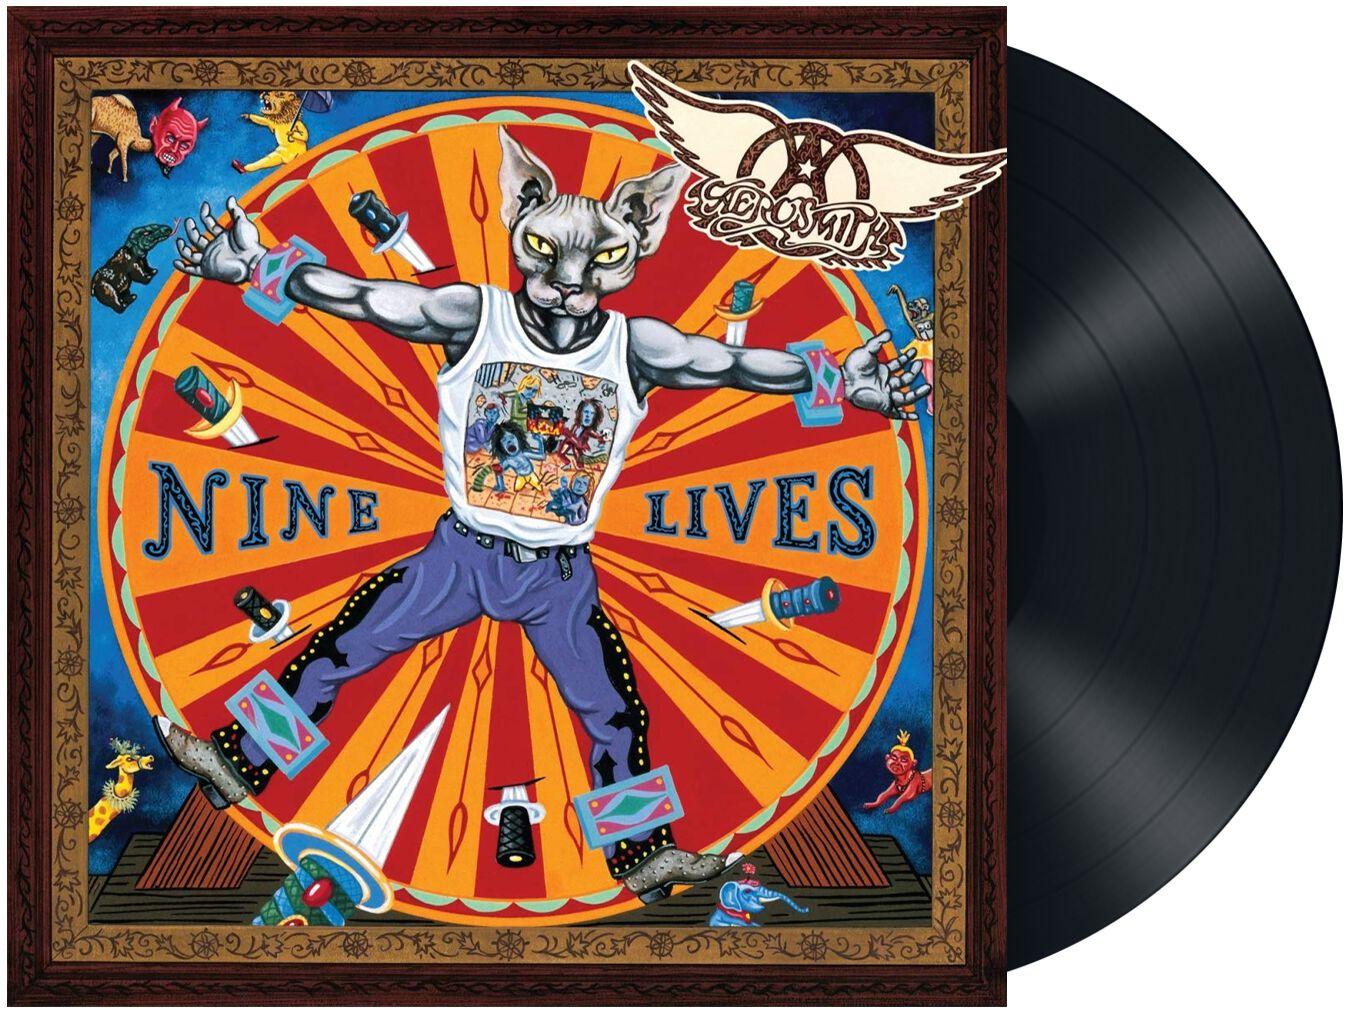 Image of Aerosmith Nine lives 2-LP Standard